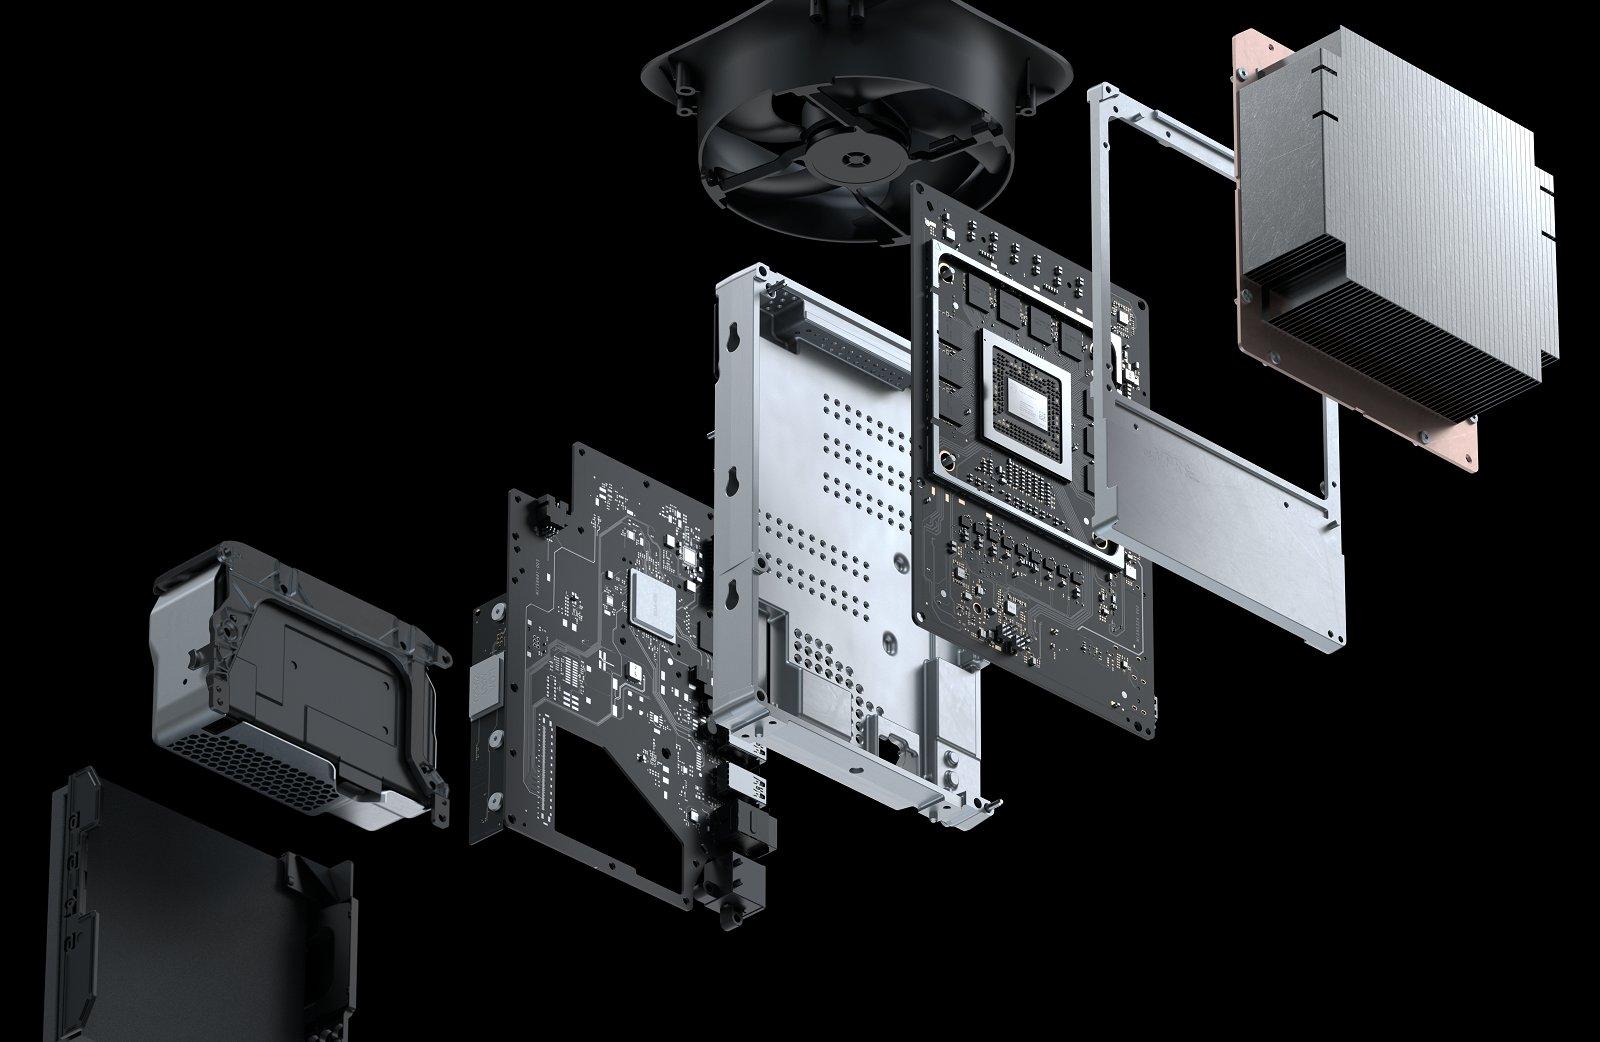 Xbox Series X Hardware tech specs (source: Microsoft)